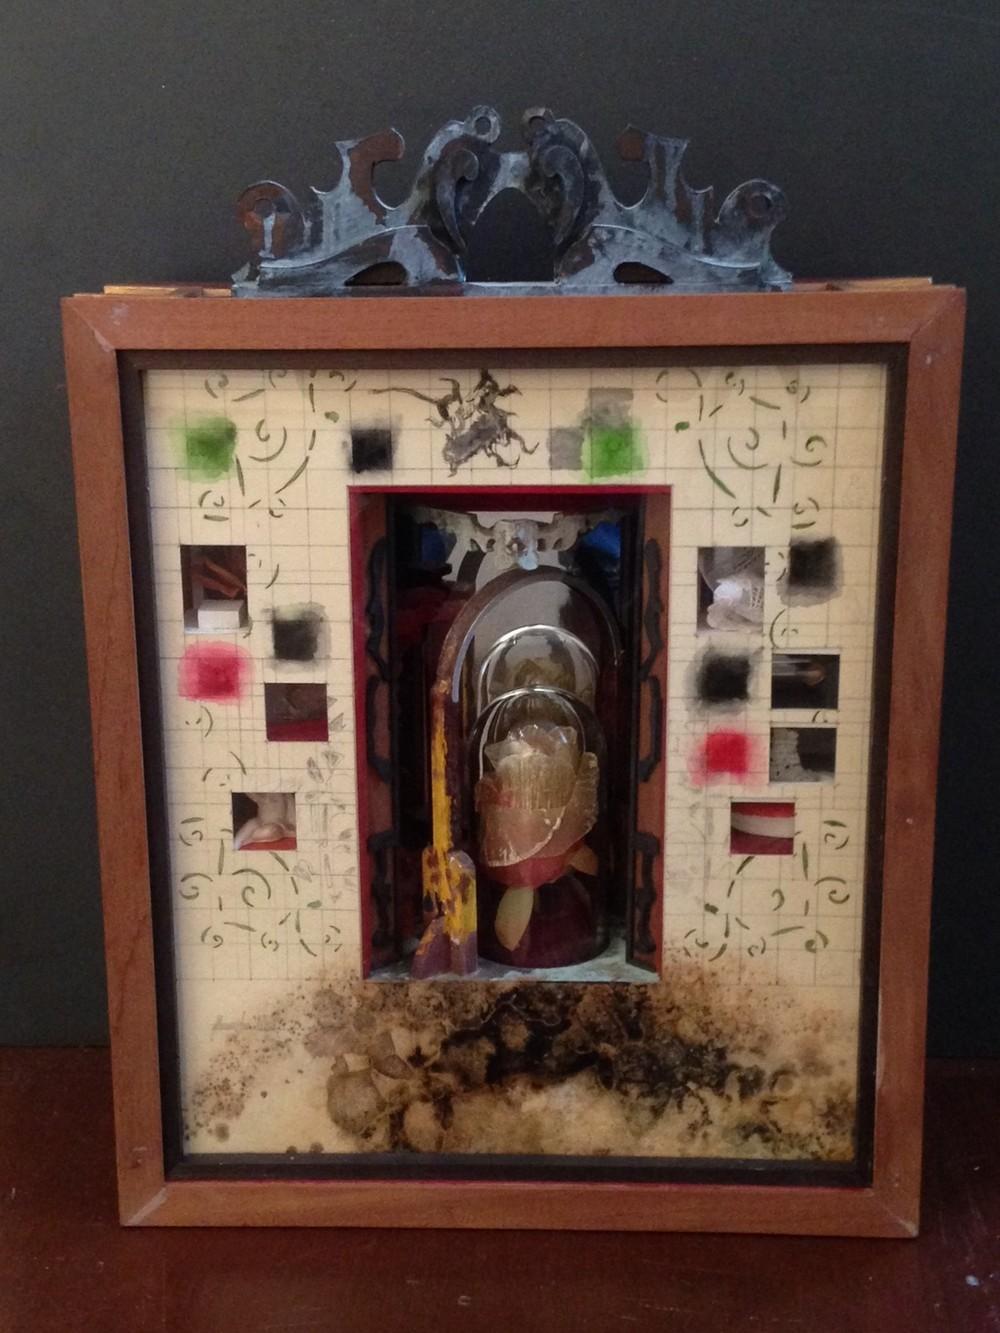 Godoy's Cabinet